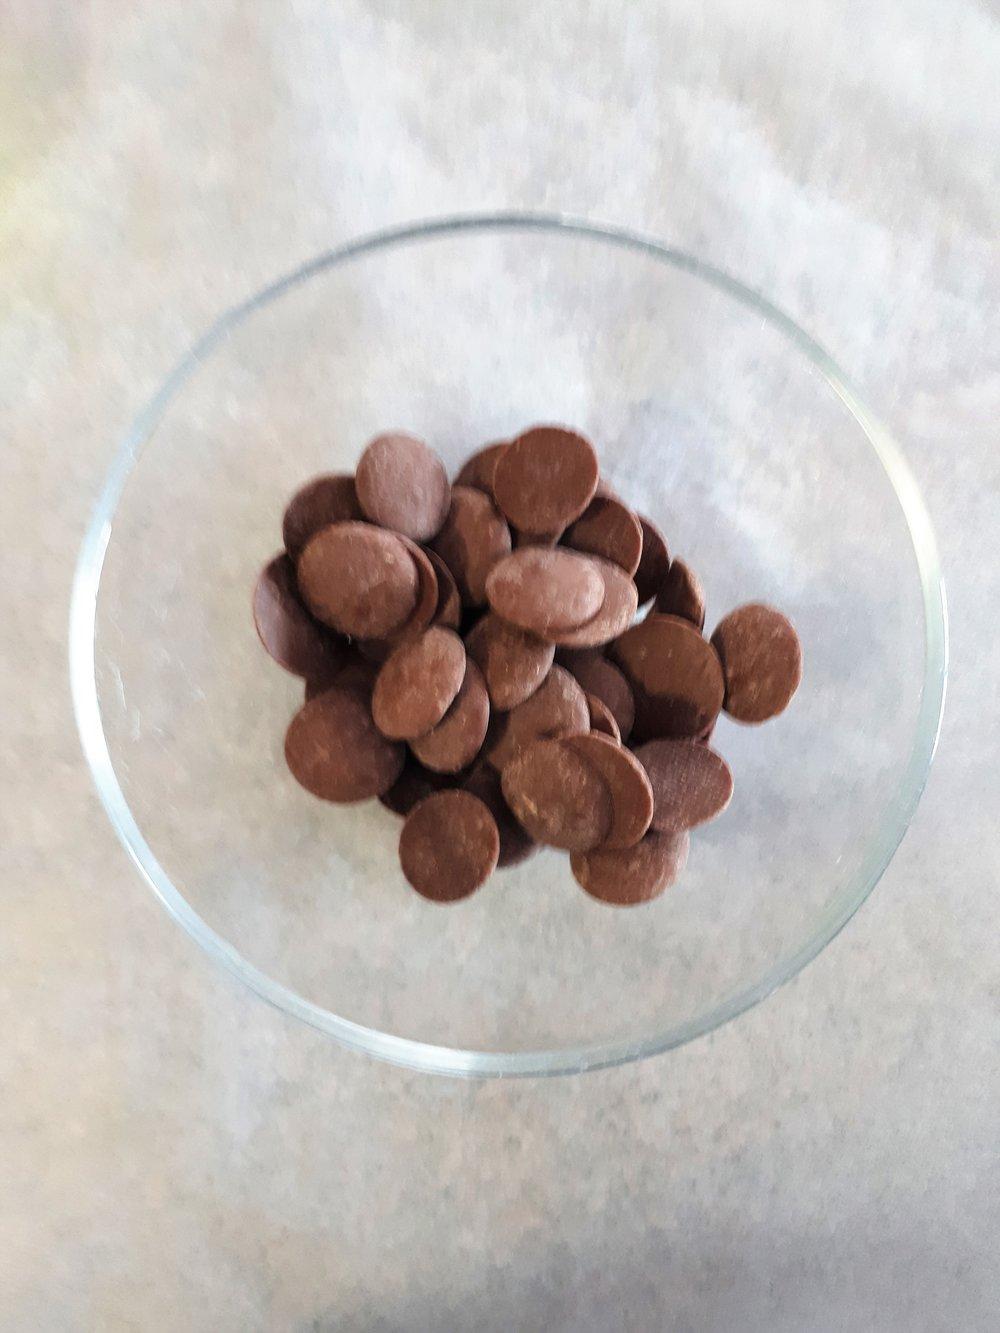 melting chocolate.jpg